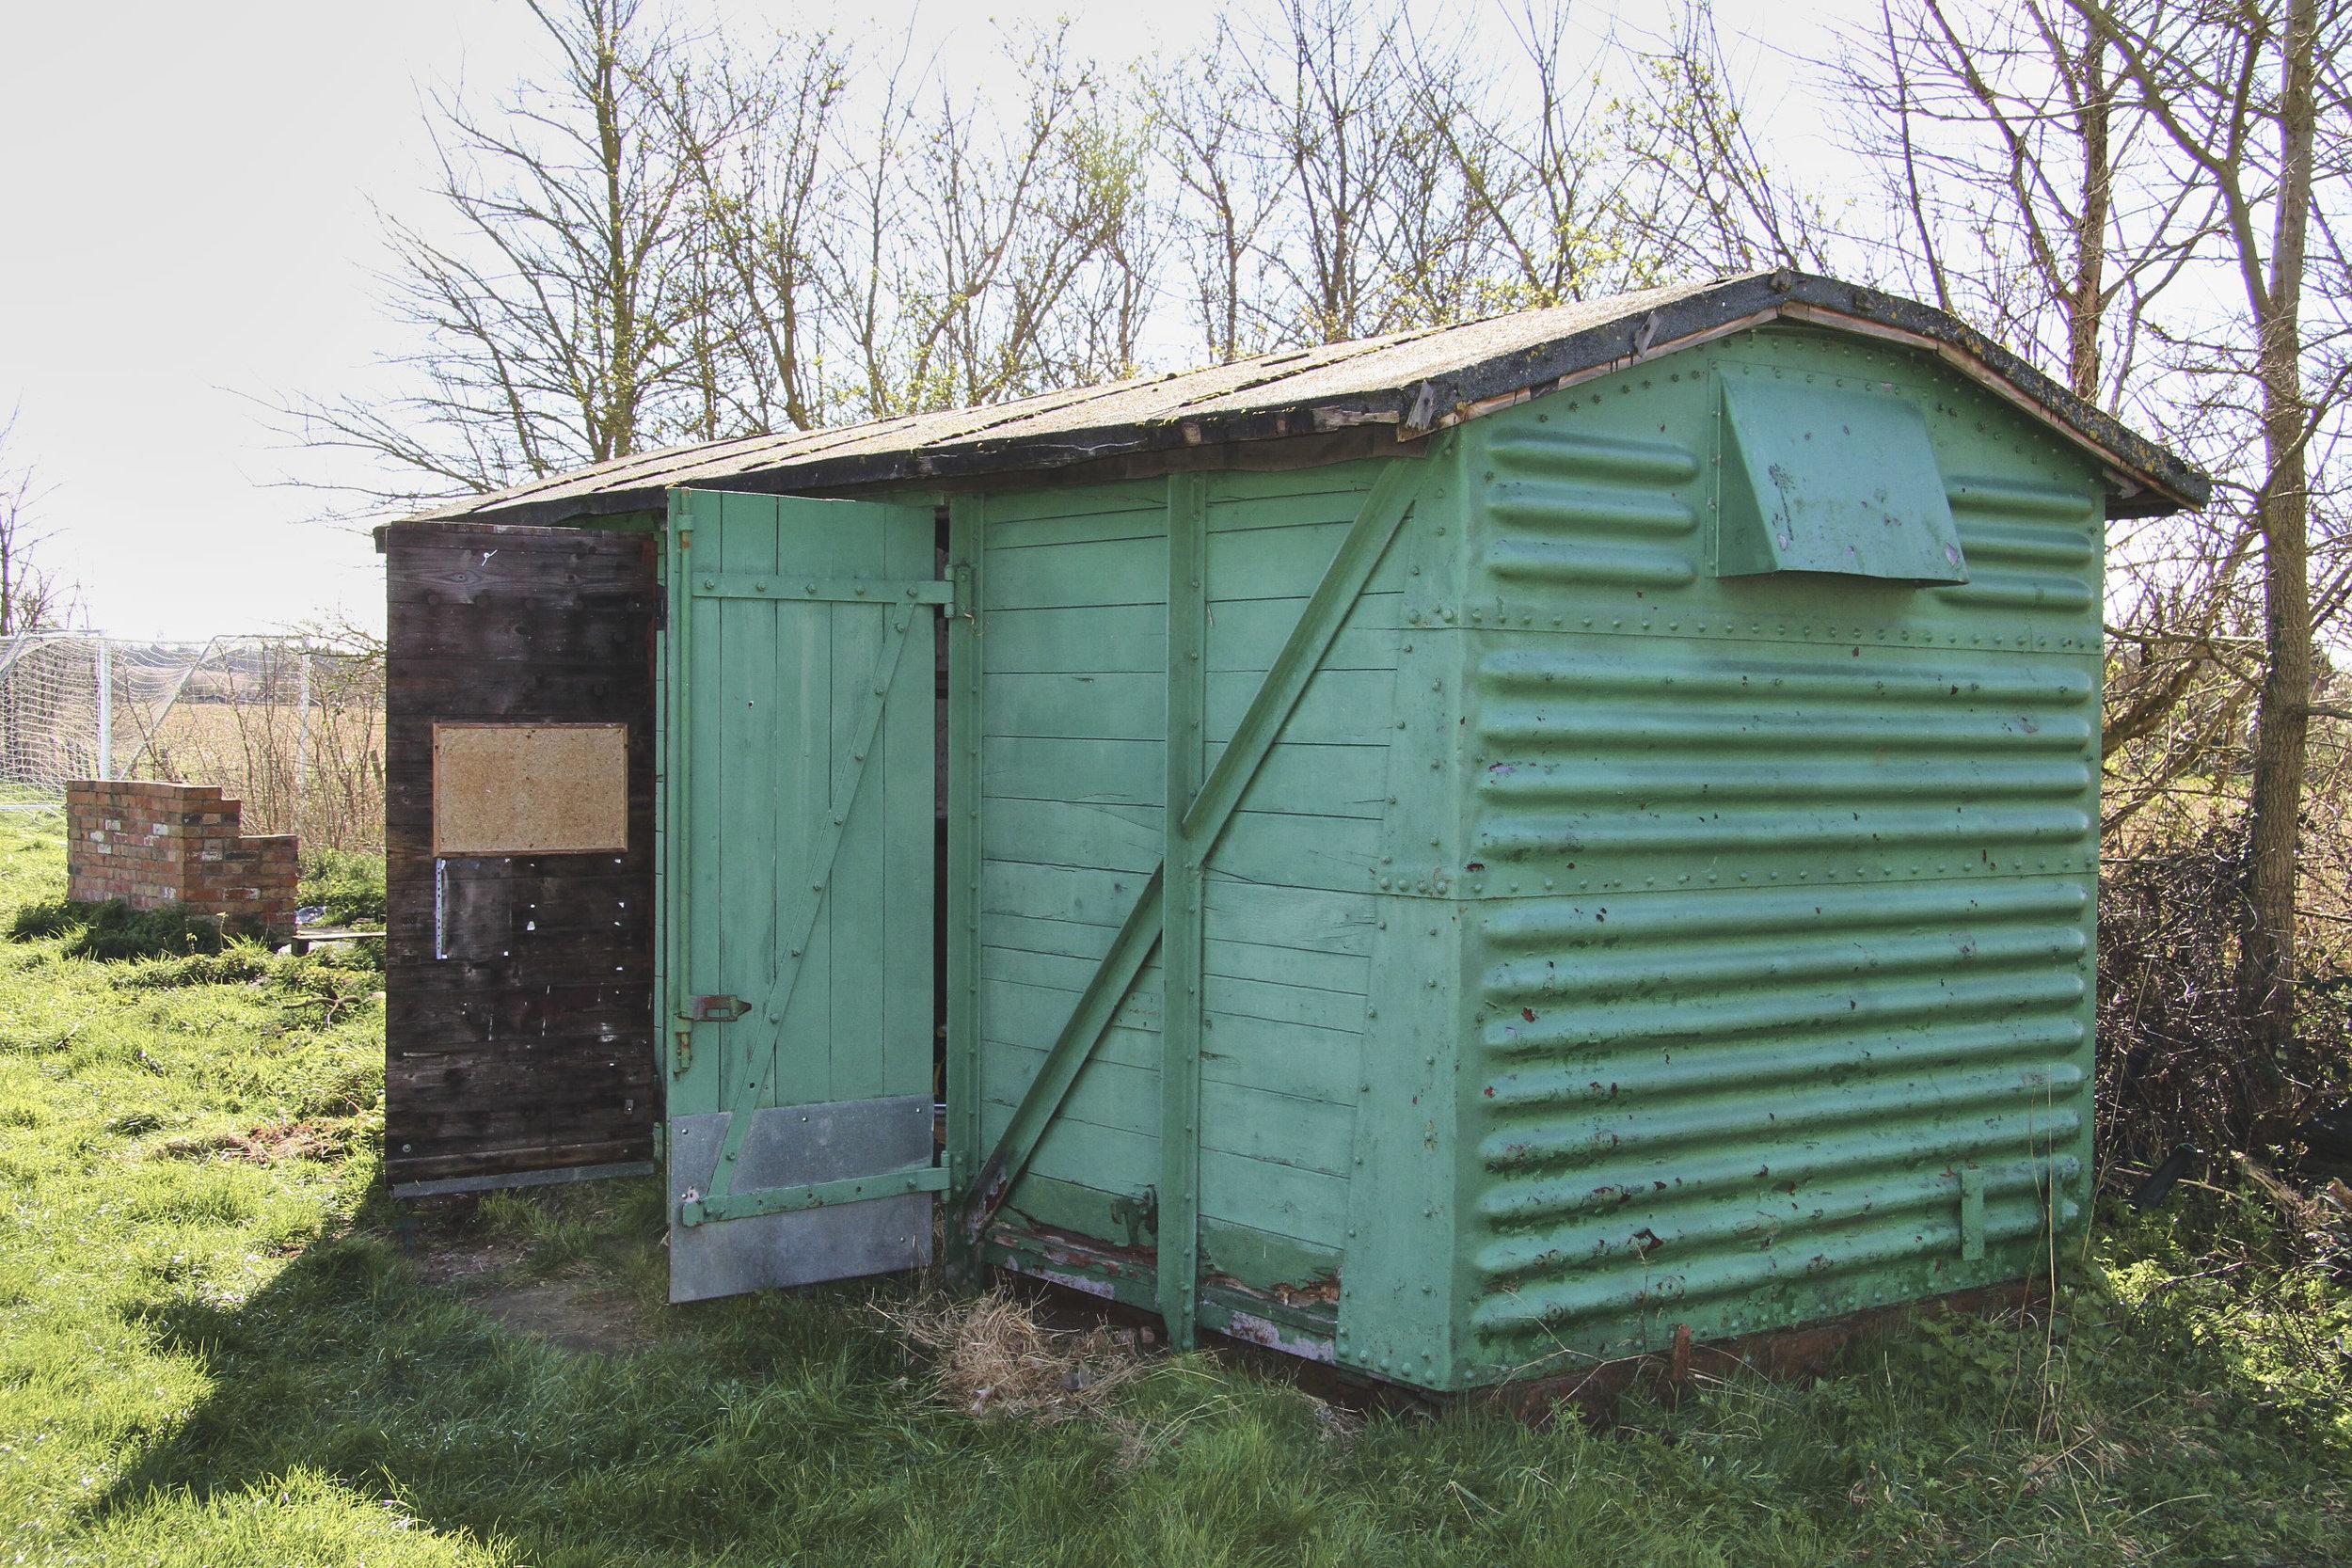 The wagon pre-renovation